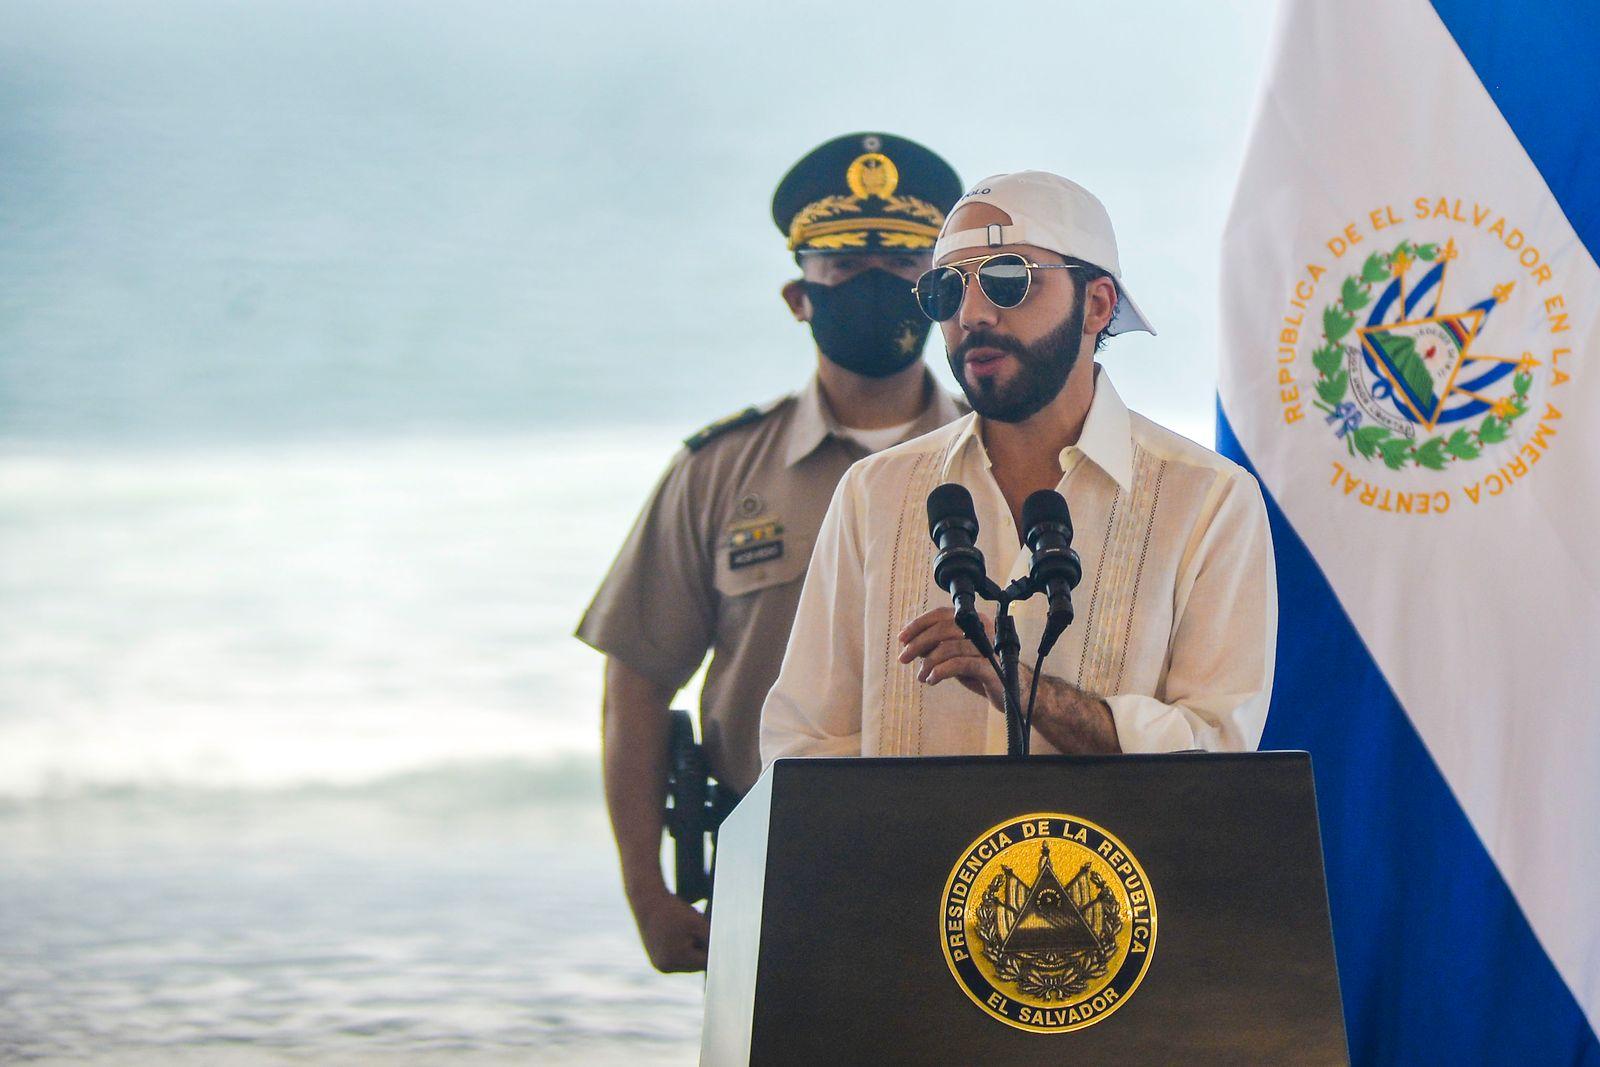 Salvadoran President, Nayib Bukele speaks during the event.